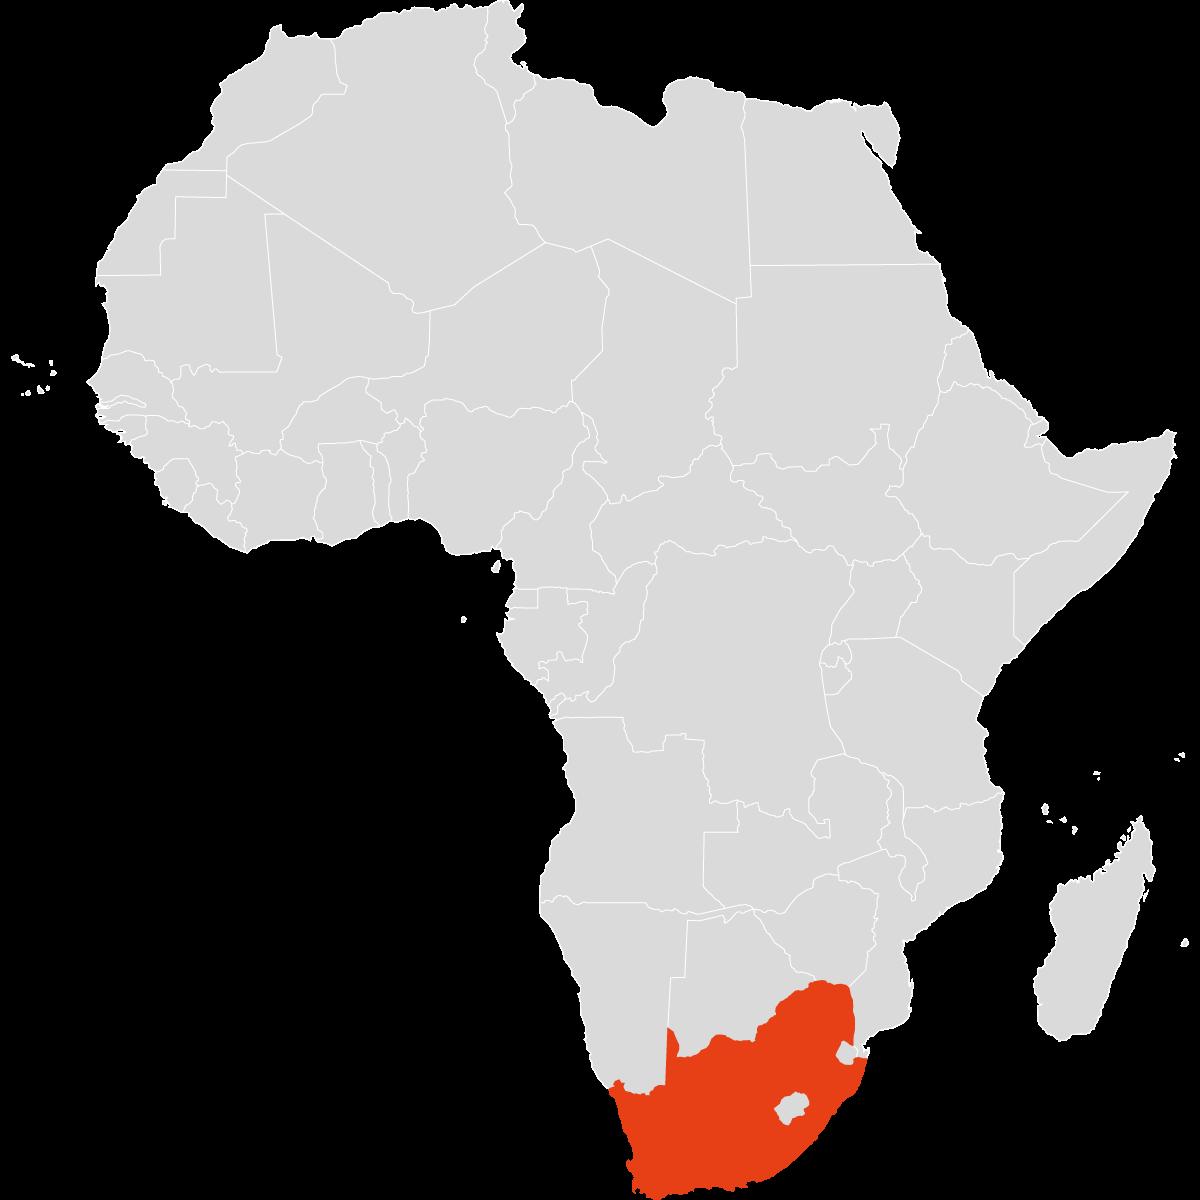 Südafrika auf dem Kontinent Afrika